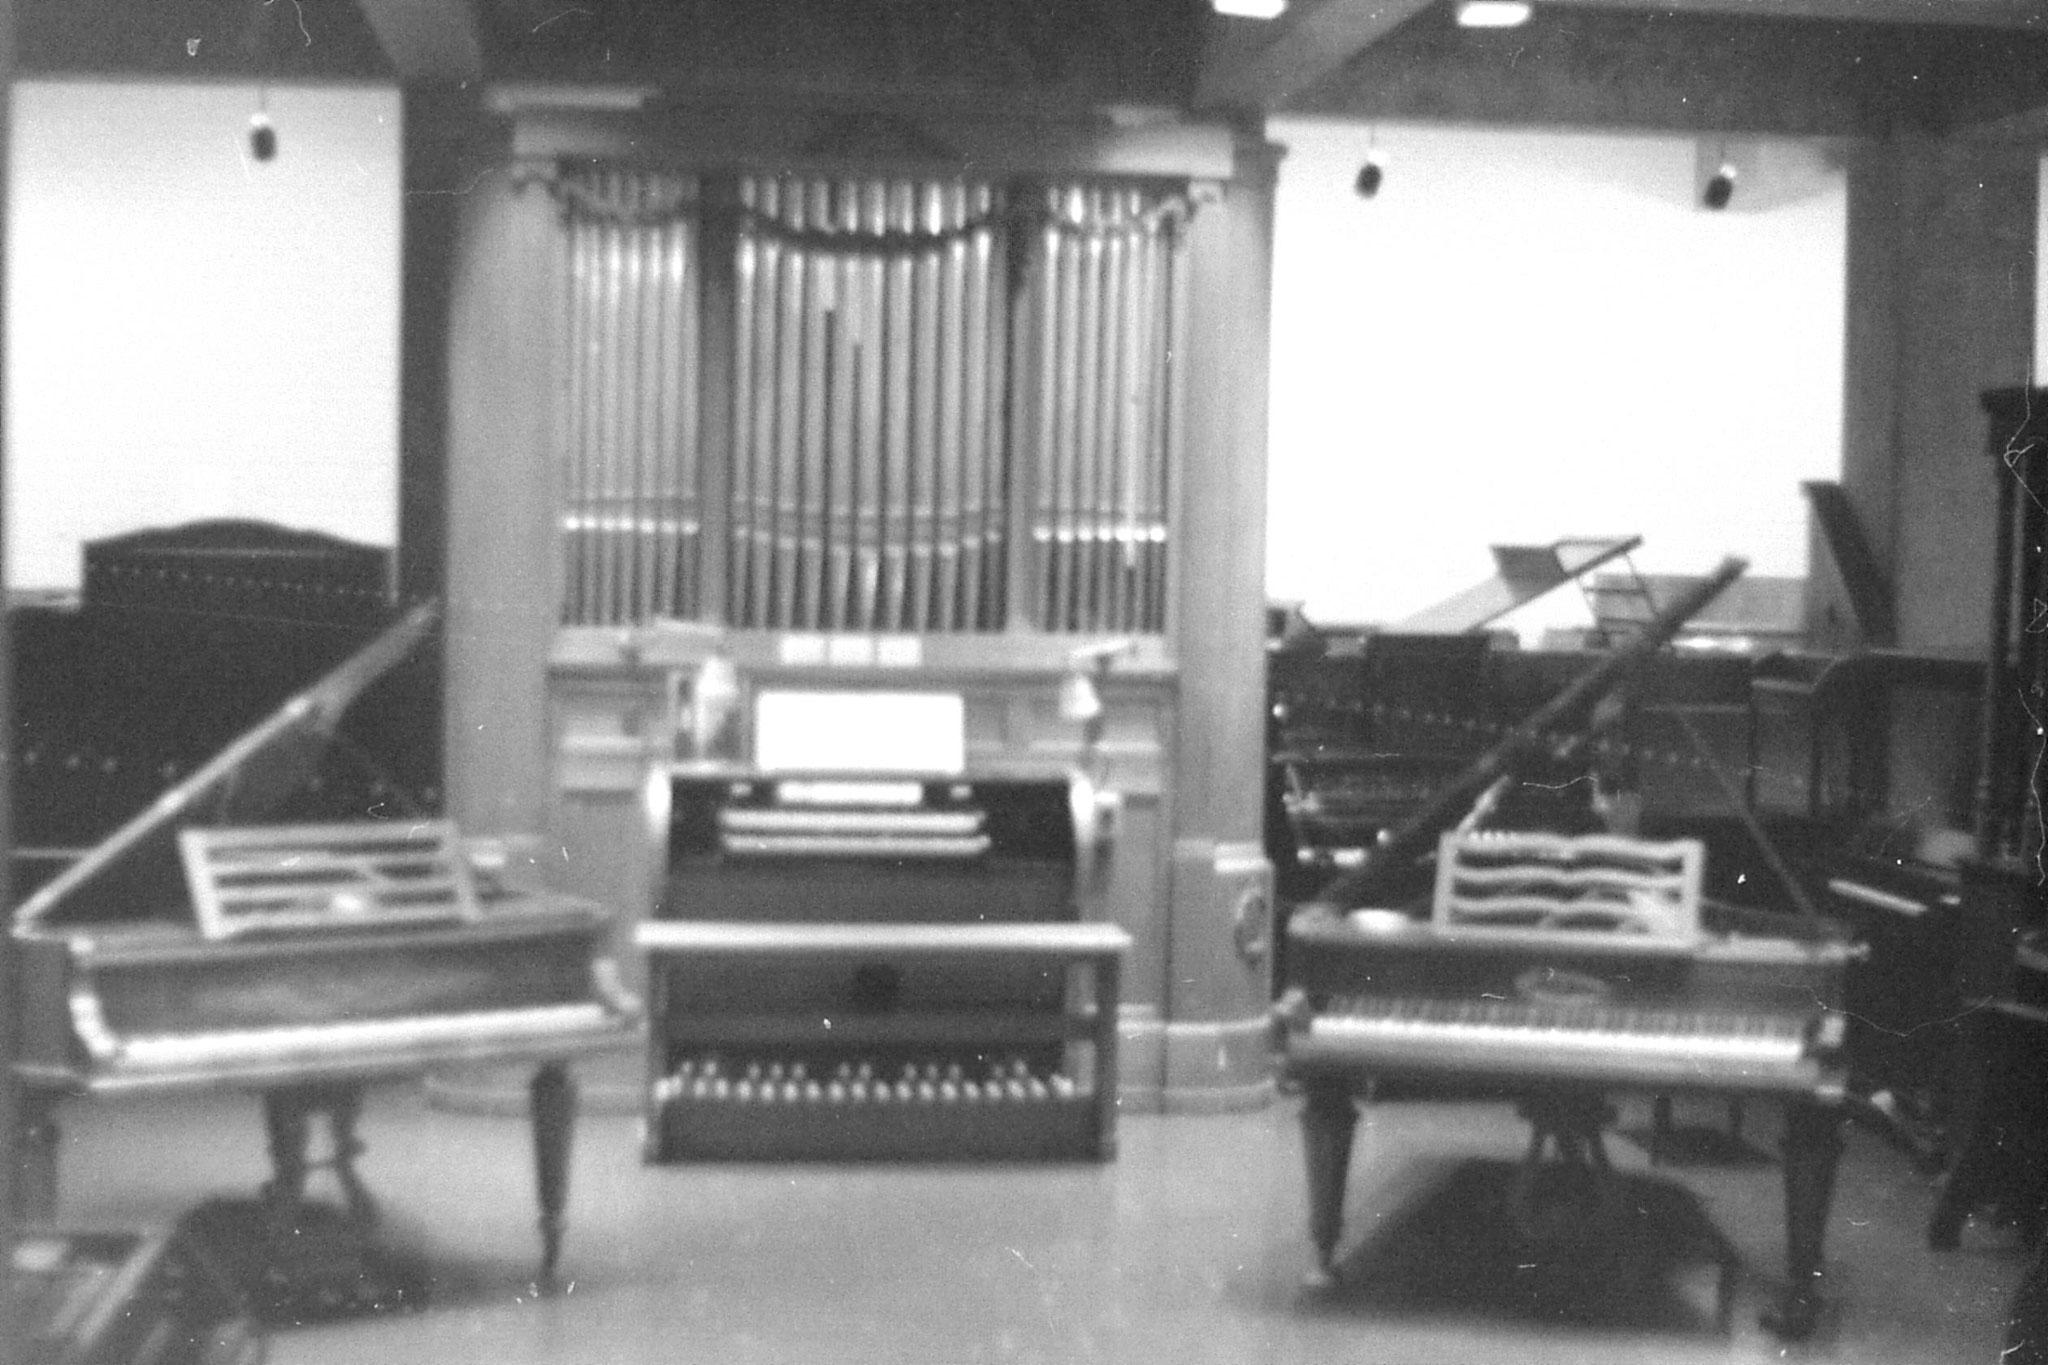 7/10/1988: 29: Sibelius museum, Turku